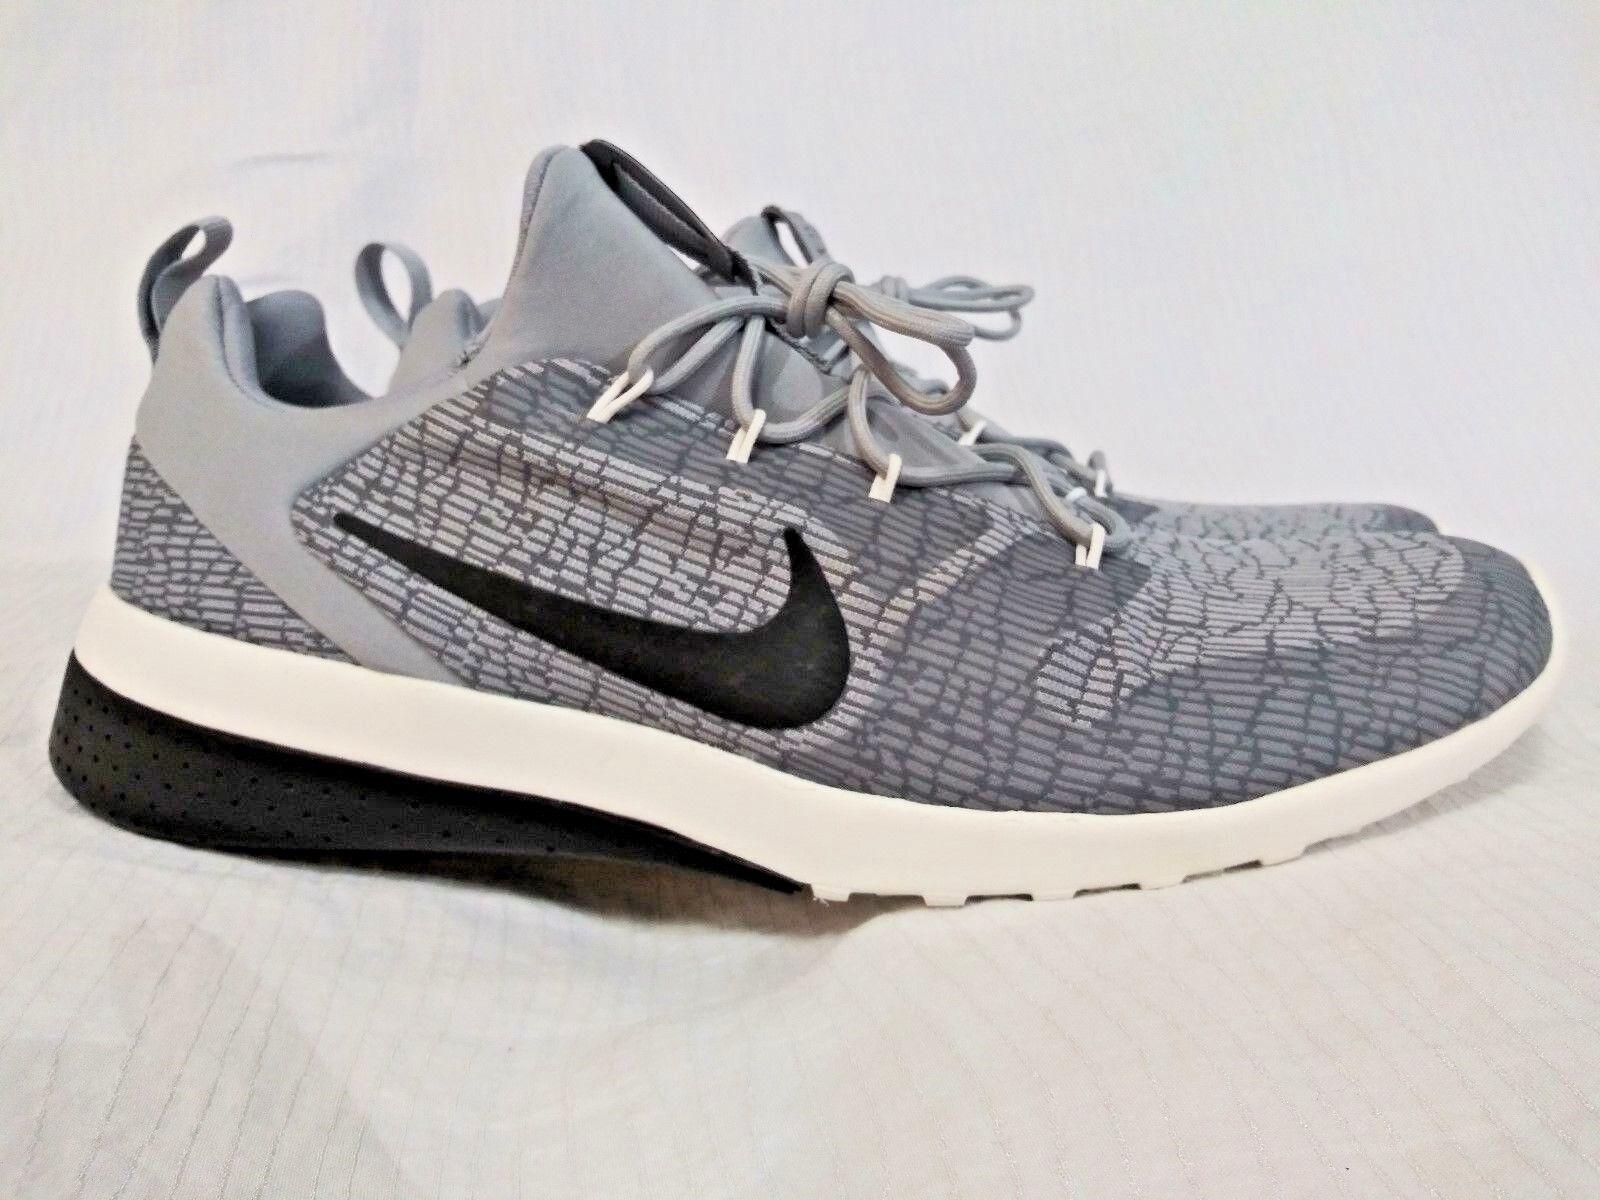 Nike Shoes Men's CK Racer Size 11 cool grey black wolf grey  916780 003